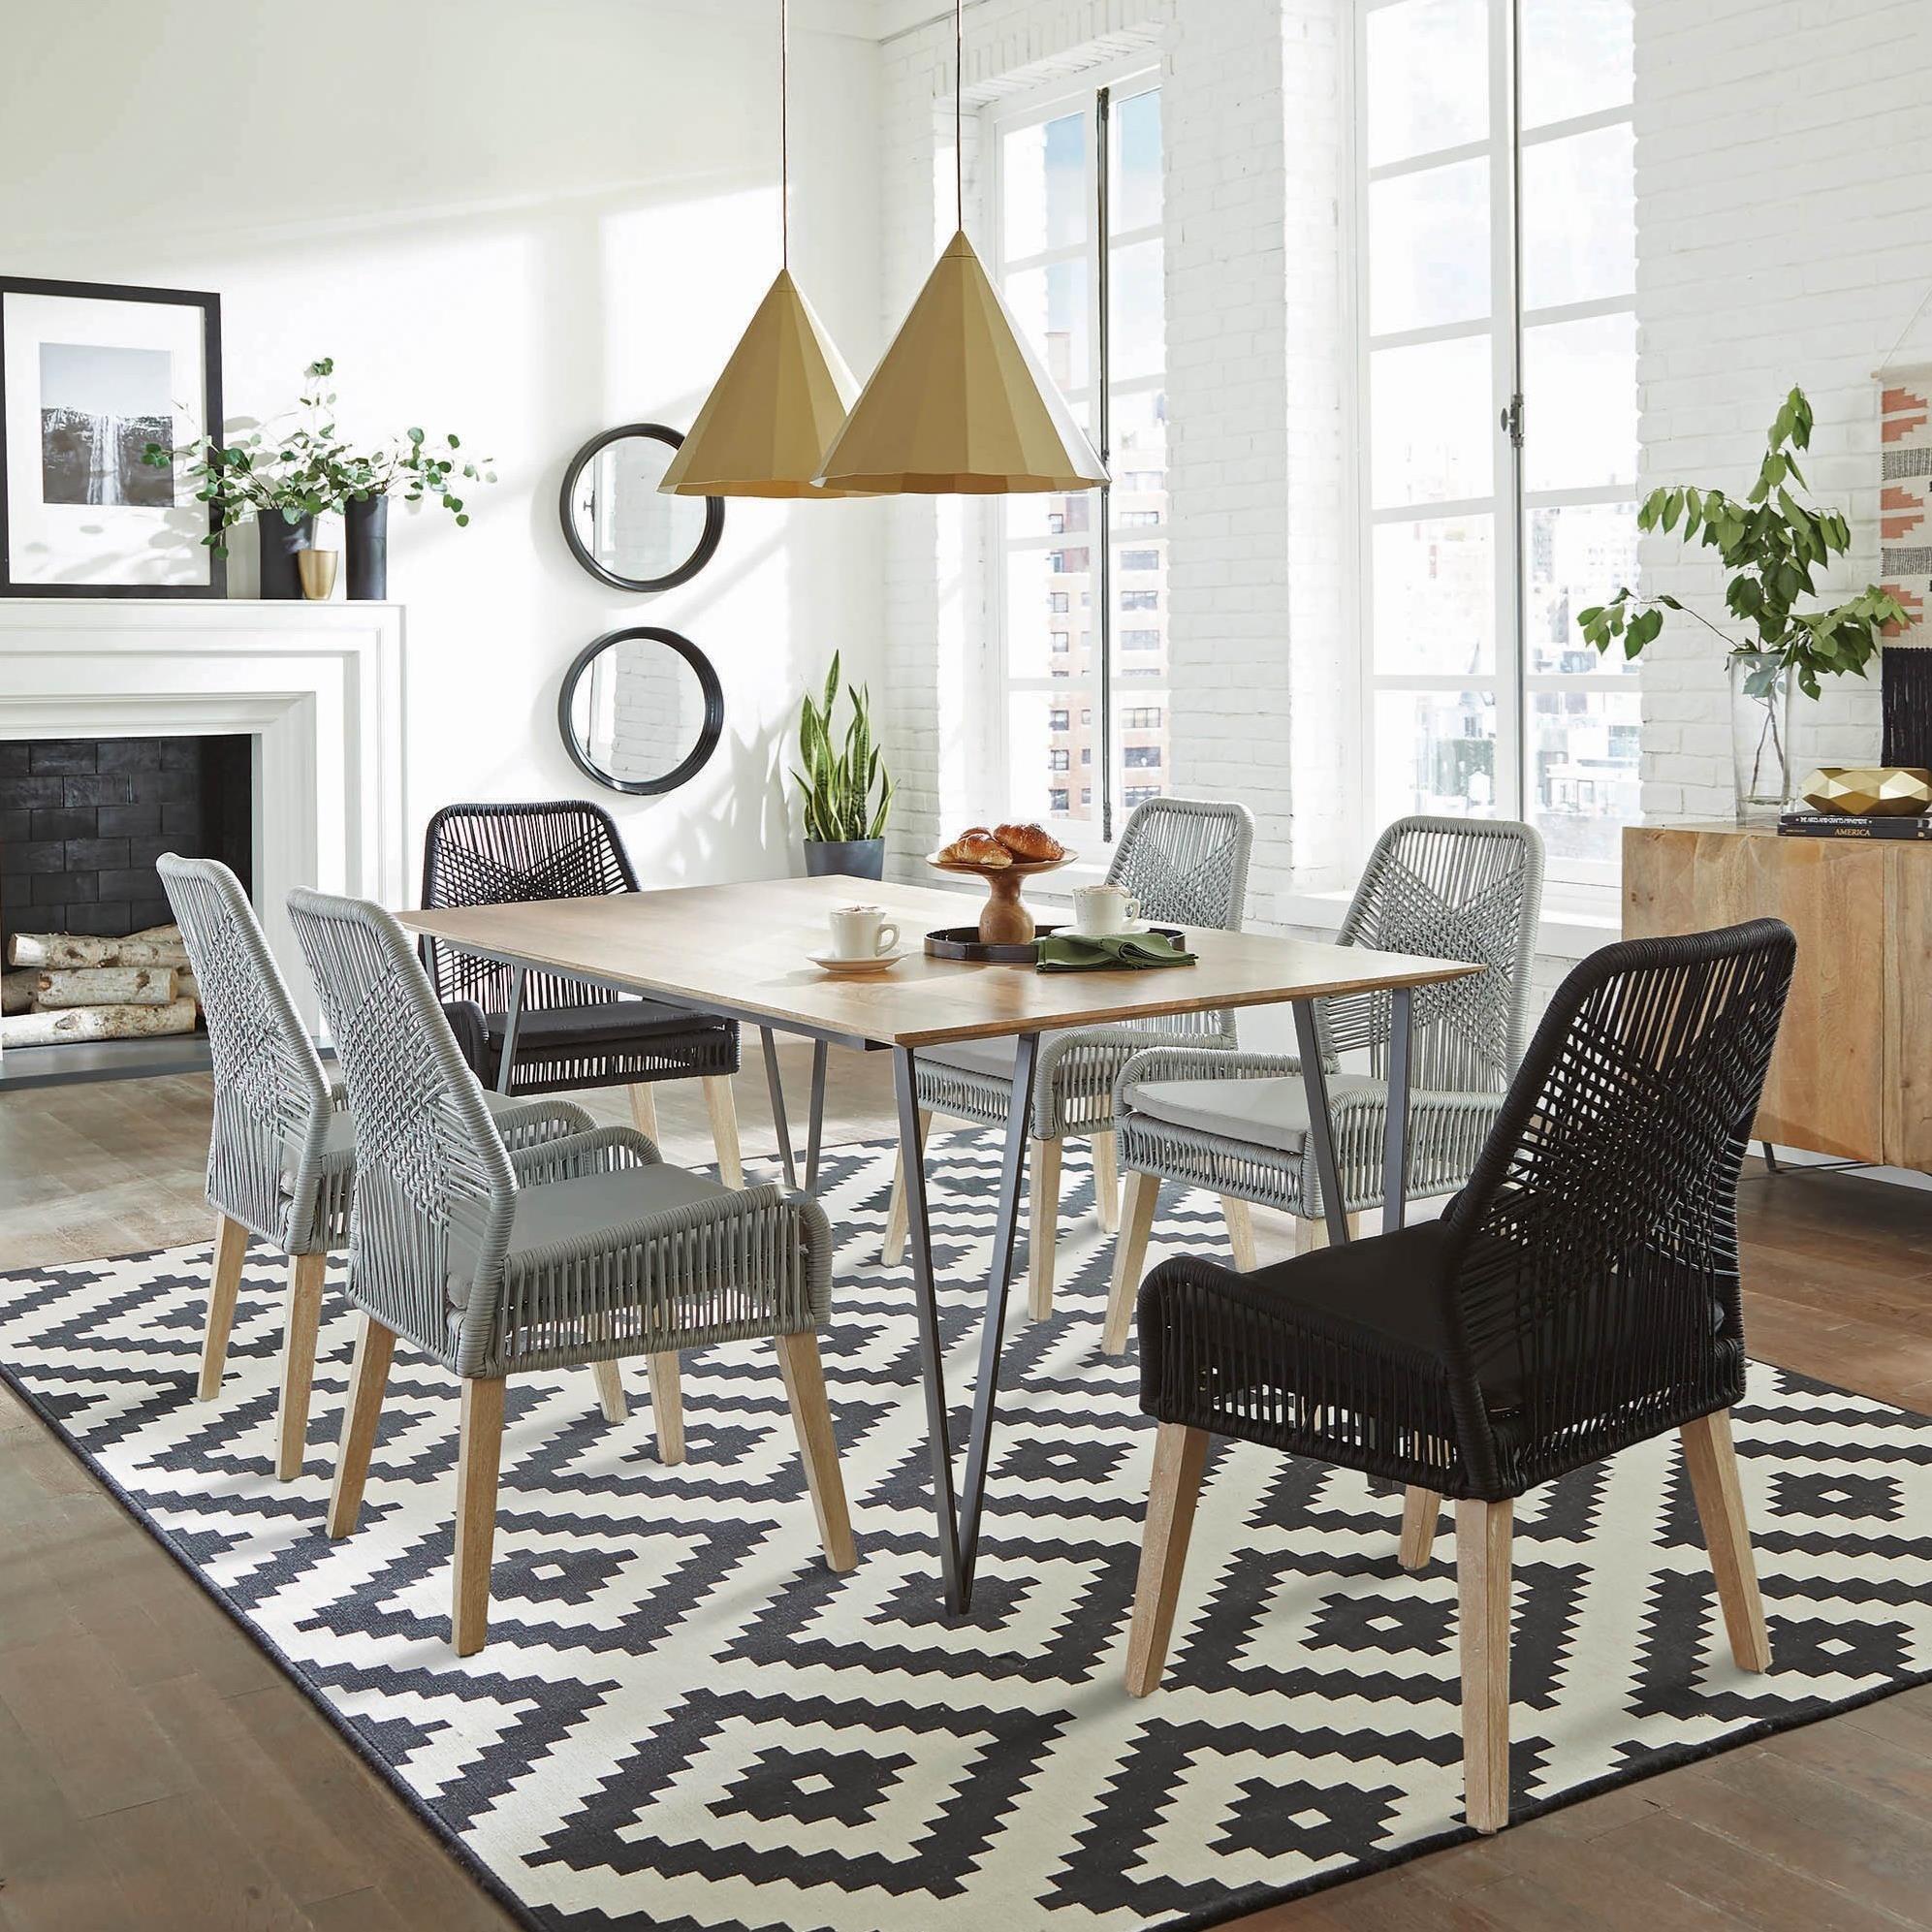 Incroyable Scott Living Sundance 7 Piece Table And Chair Set